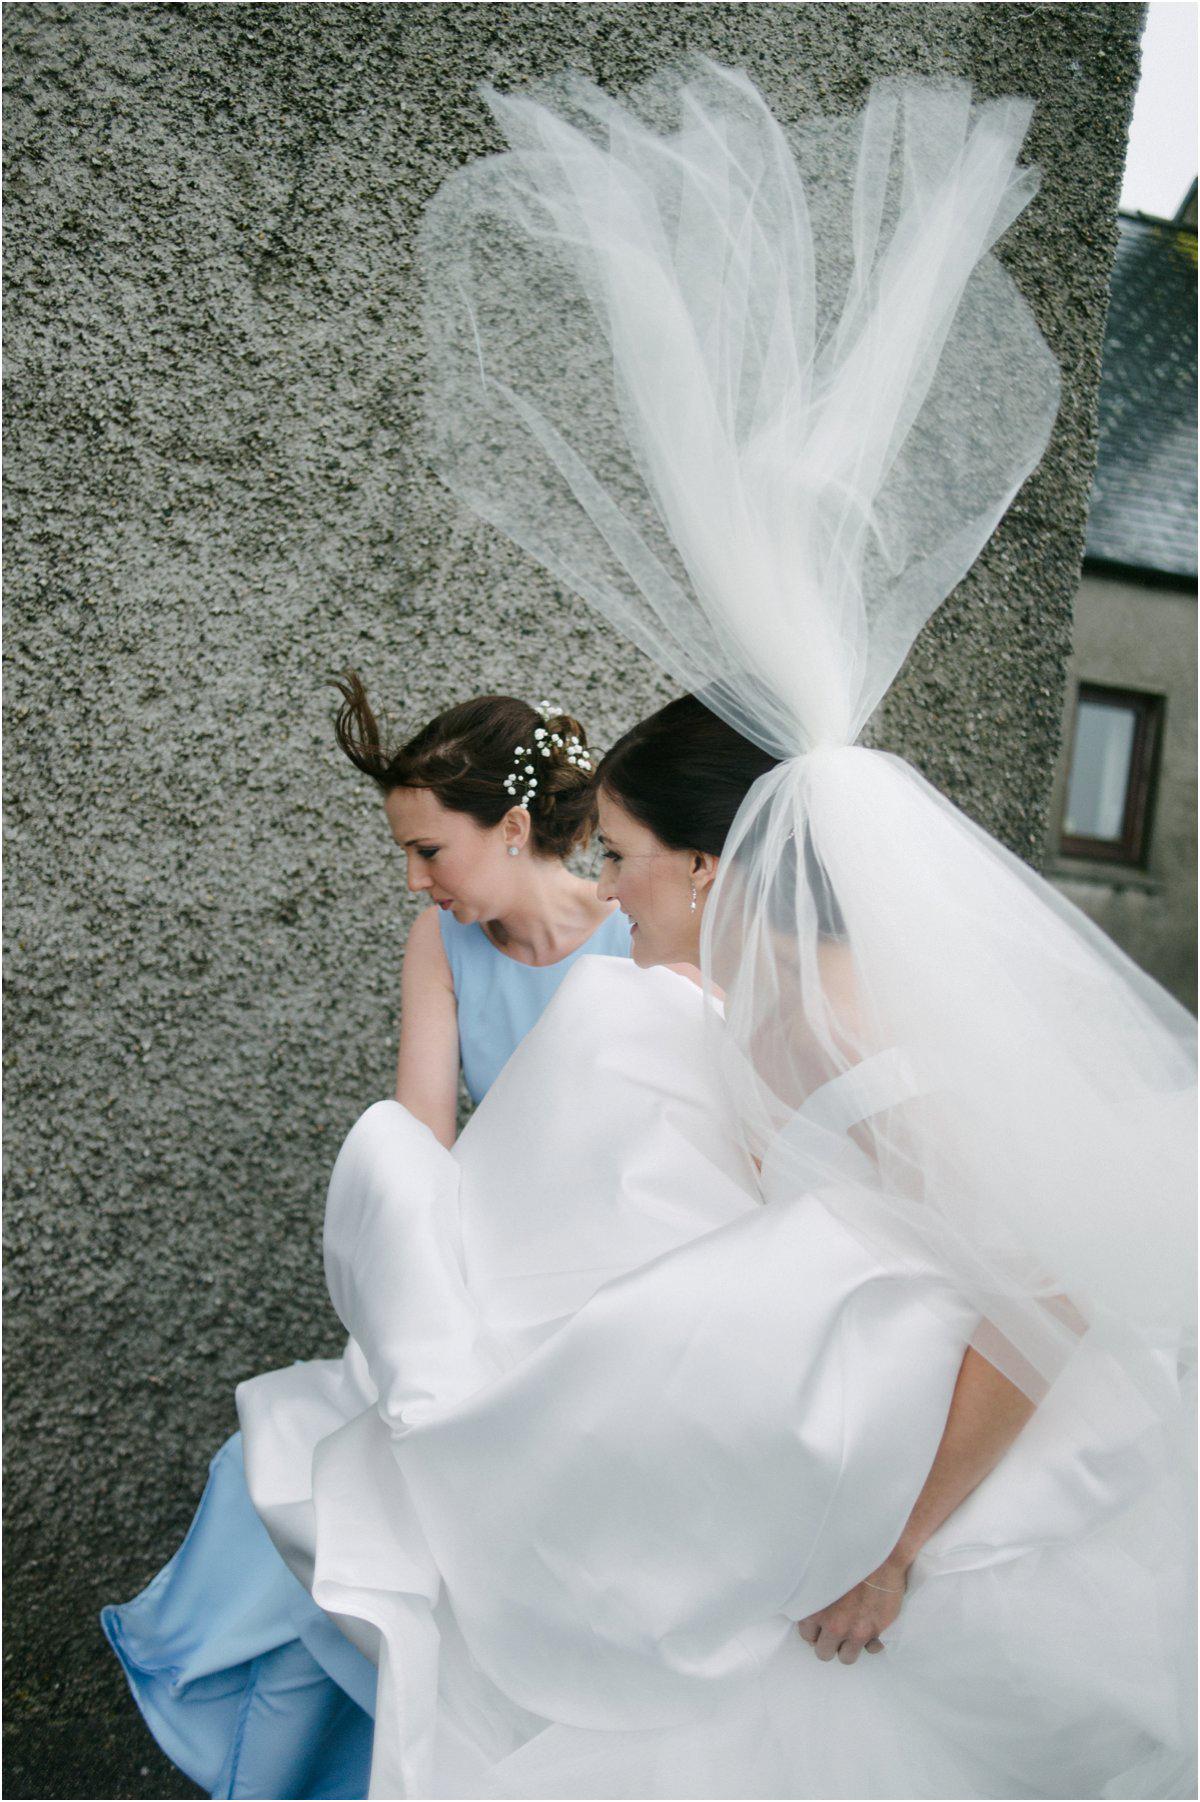 Crofts & Kowalczyk Best Wedding Photography Scotland Blogpost-101.jpg